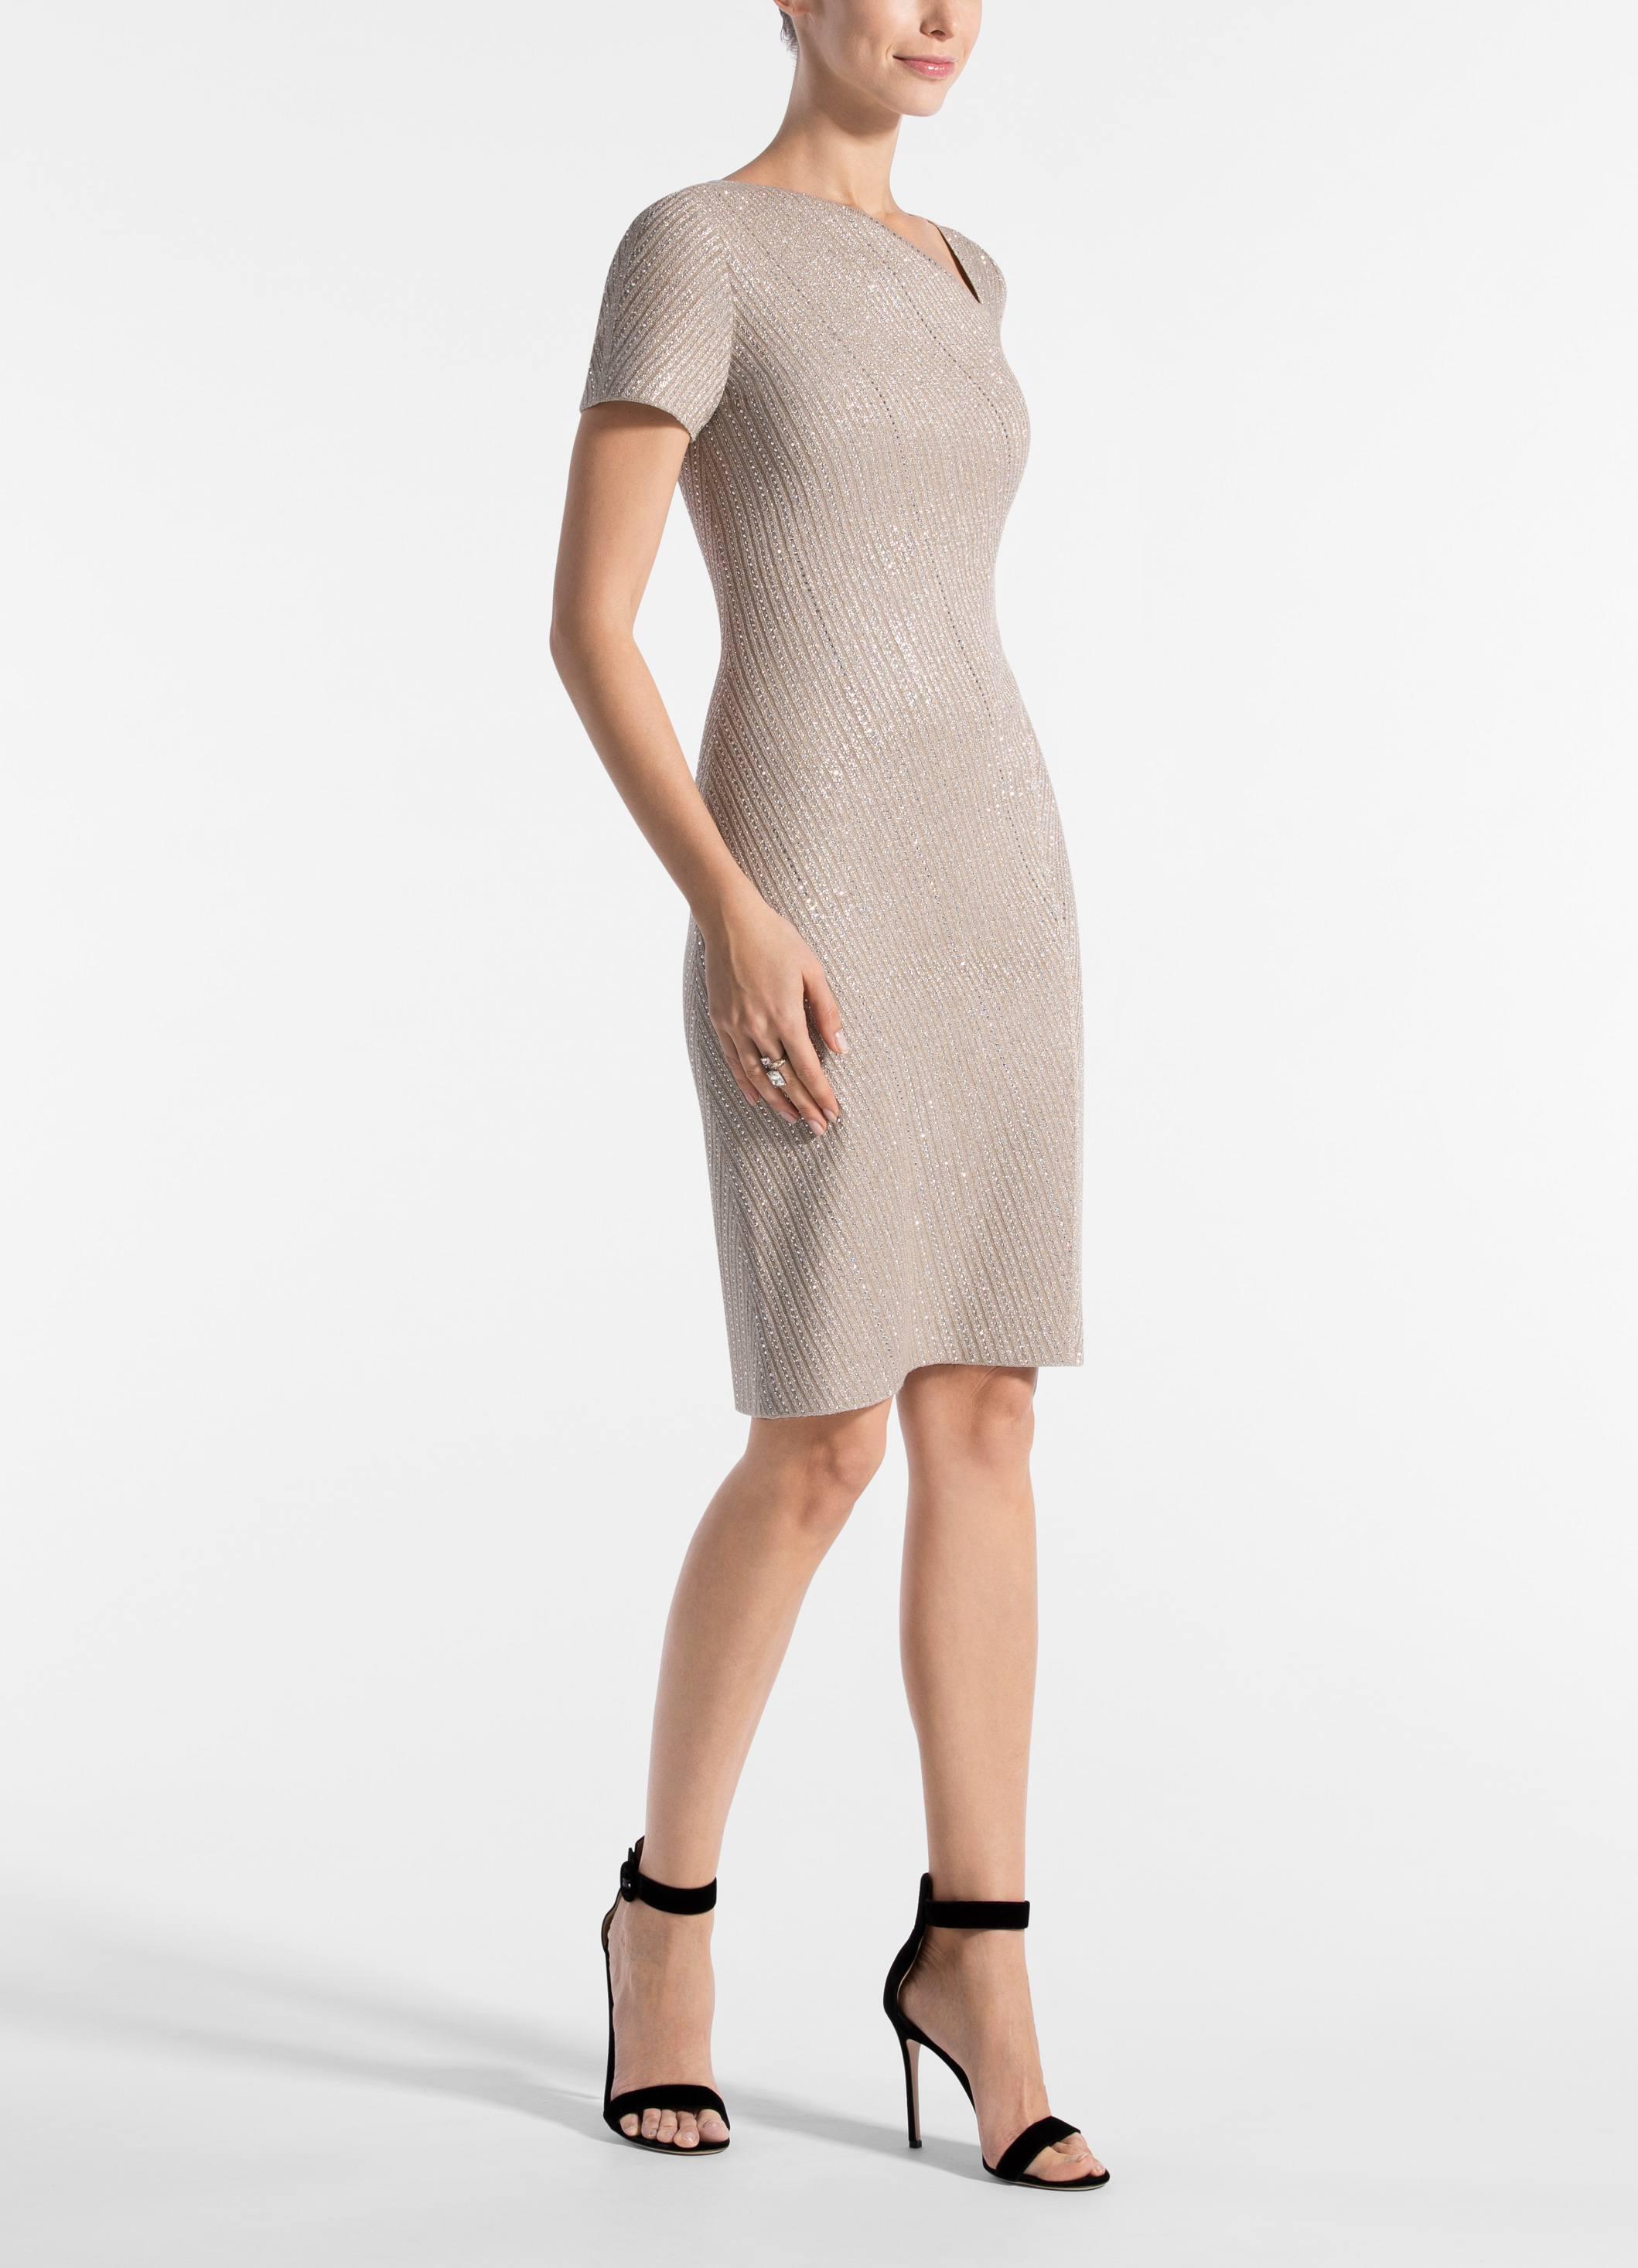 2819c625849c St. John - Natural Brielle Knit Asymmetrical Neck Dress - Lyst. View  fullscreen